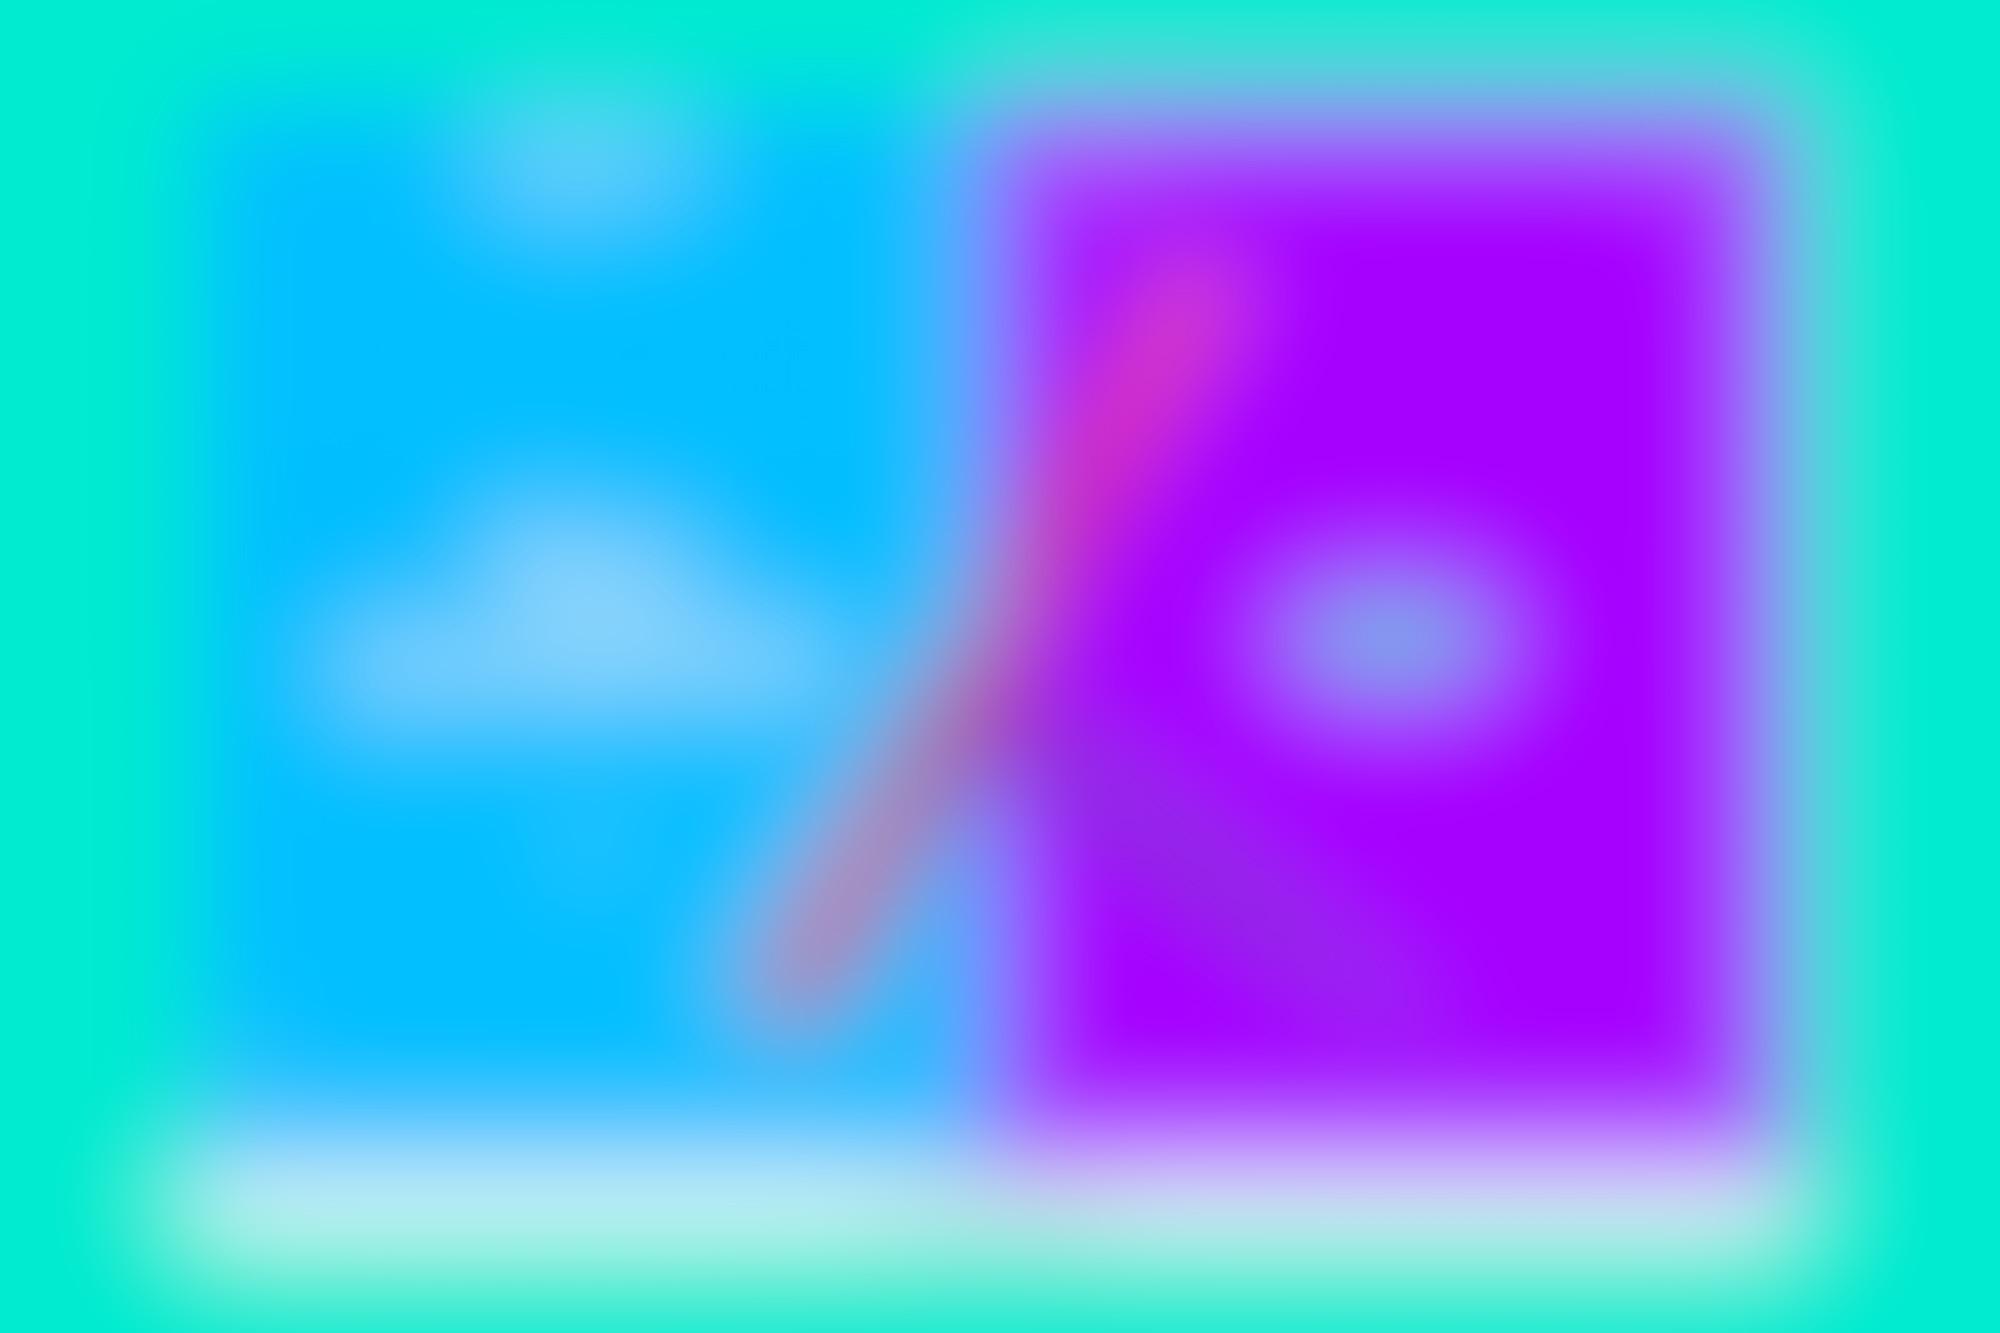 17 Logitech Design Studio 2015 autocompressfitresizeixlibphp 1 1 0max h2000max w3 D2000q80s2ba23dc688b70a01fd3e0a5a8d95b80d